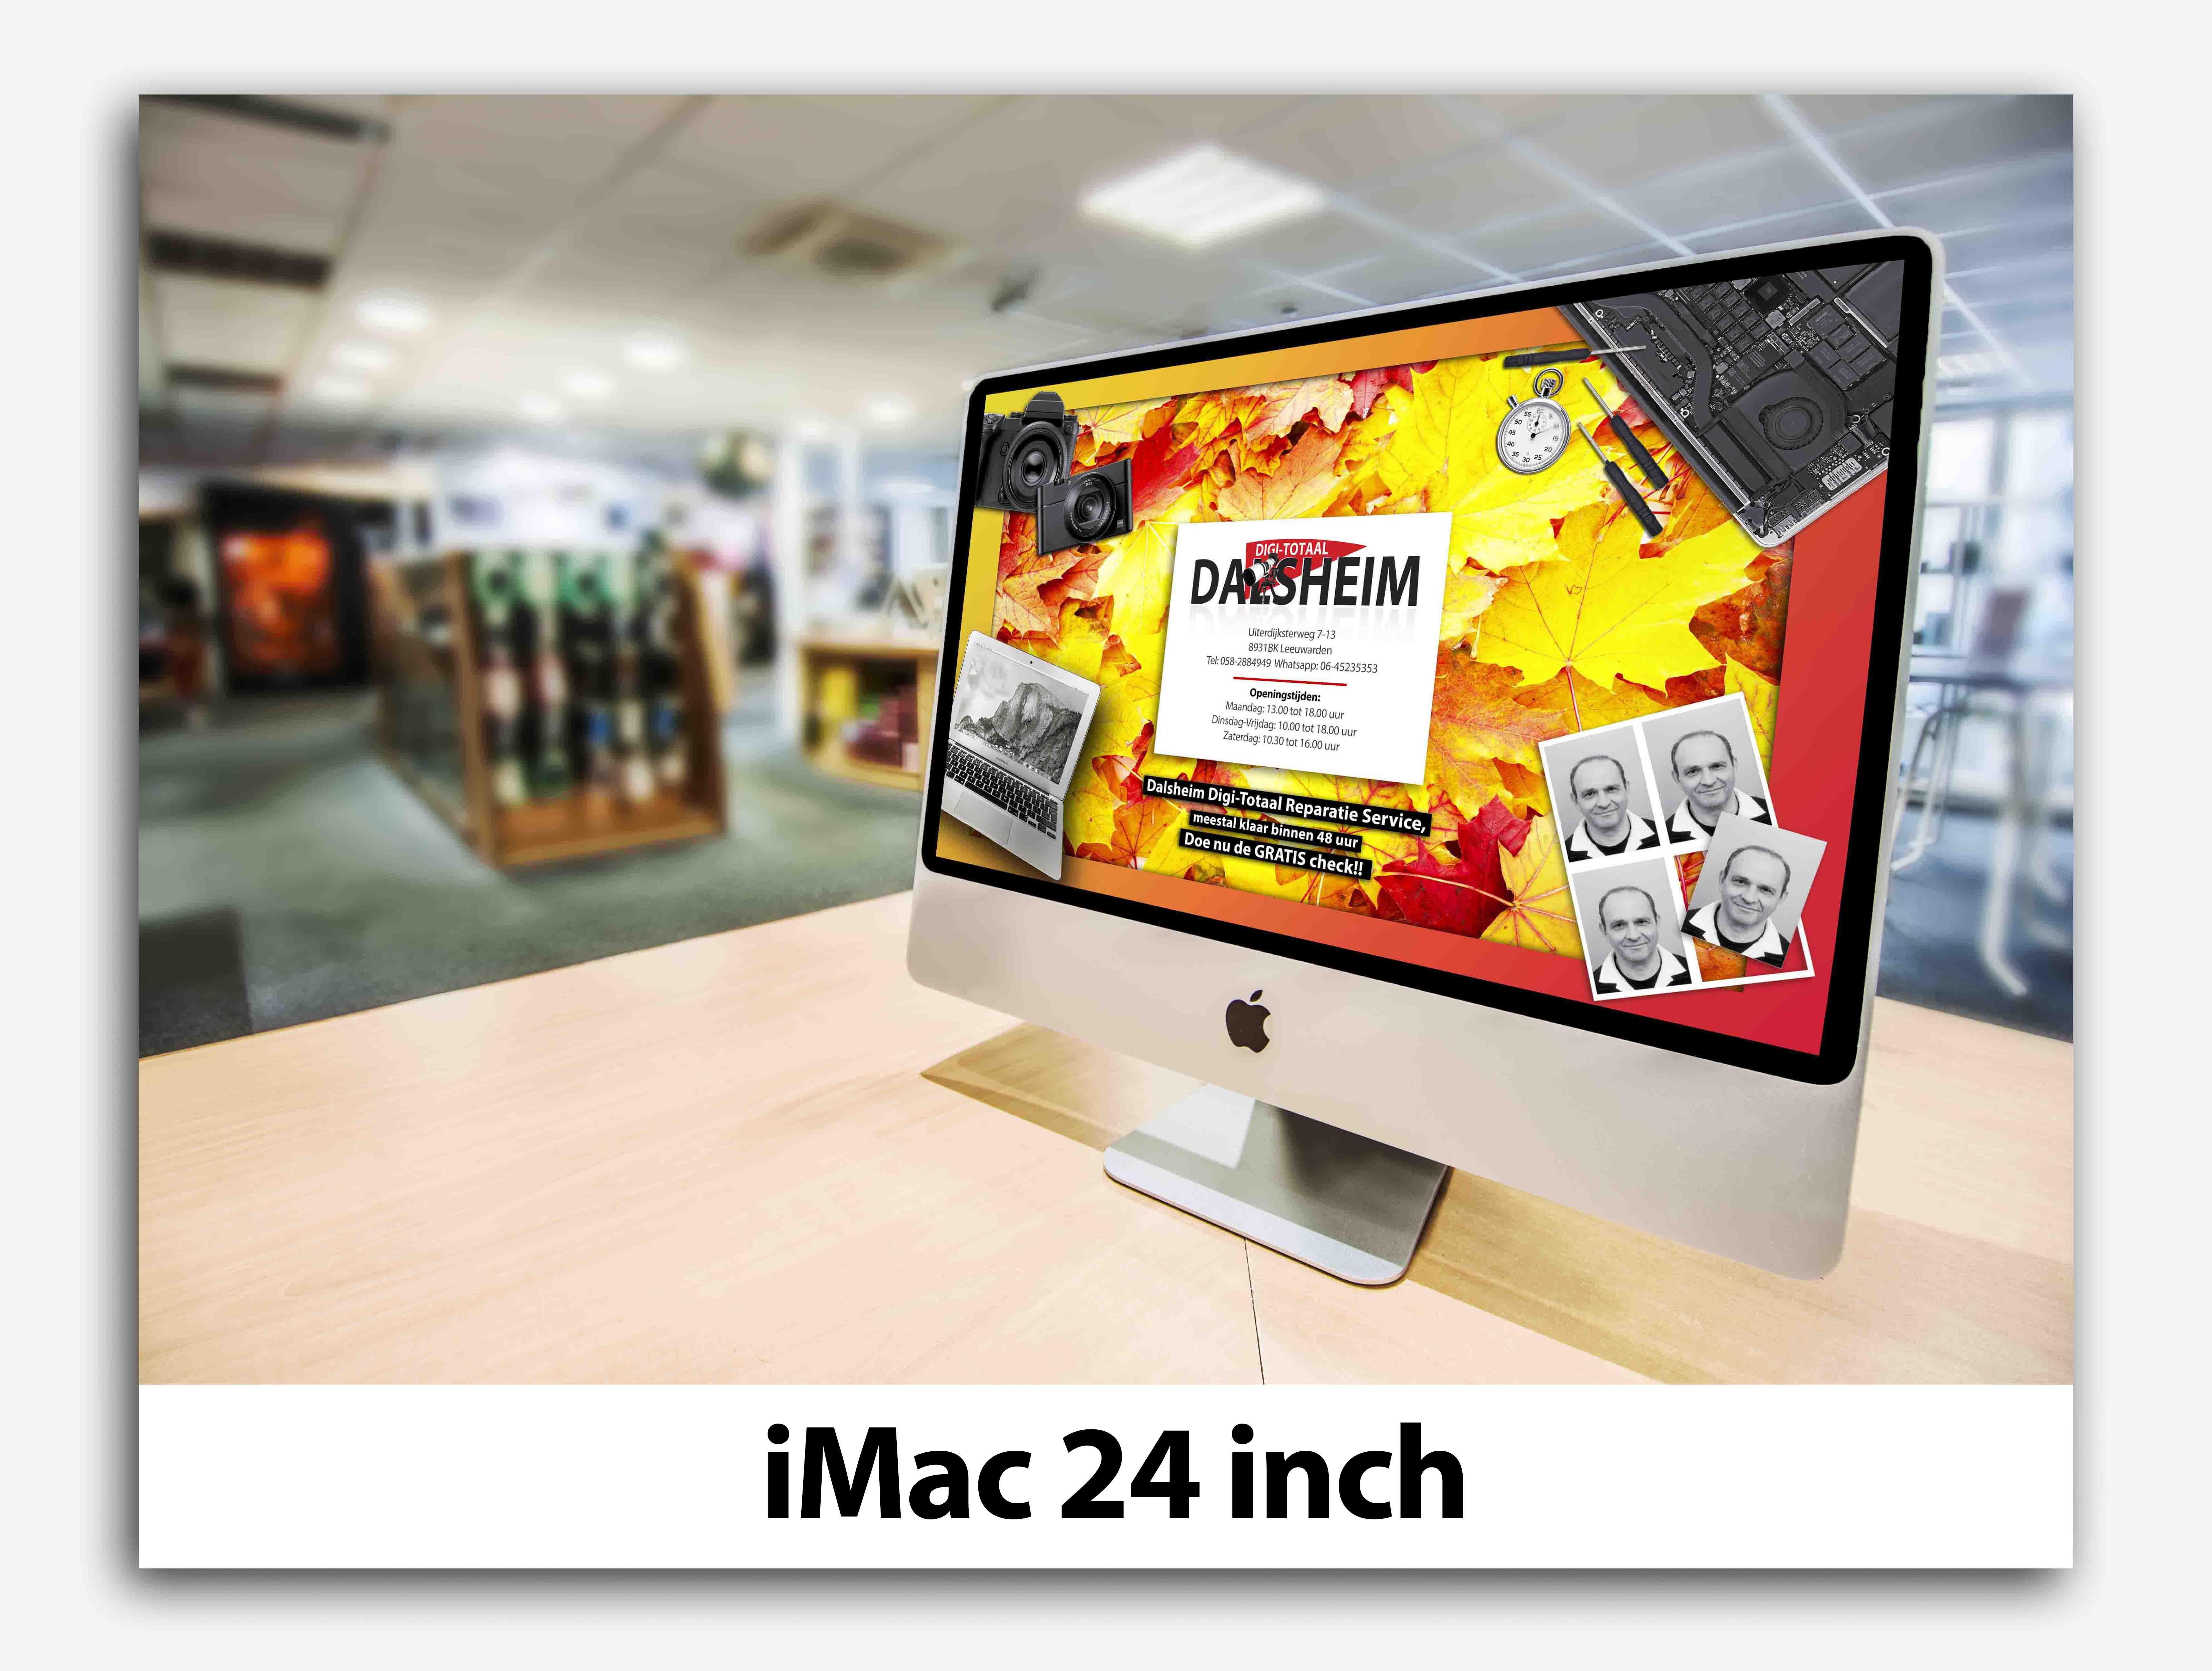 iMac 24 inch apple dalsheim digi-totaal leeuwarden